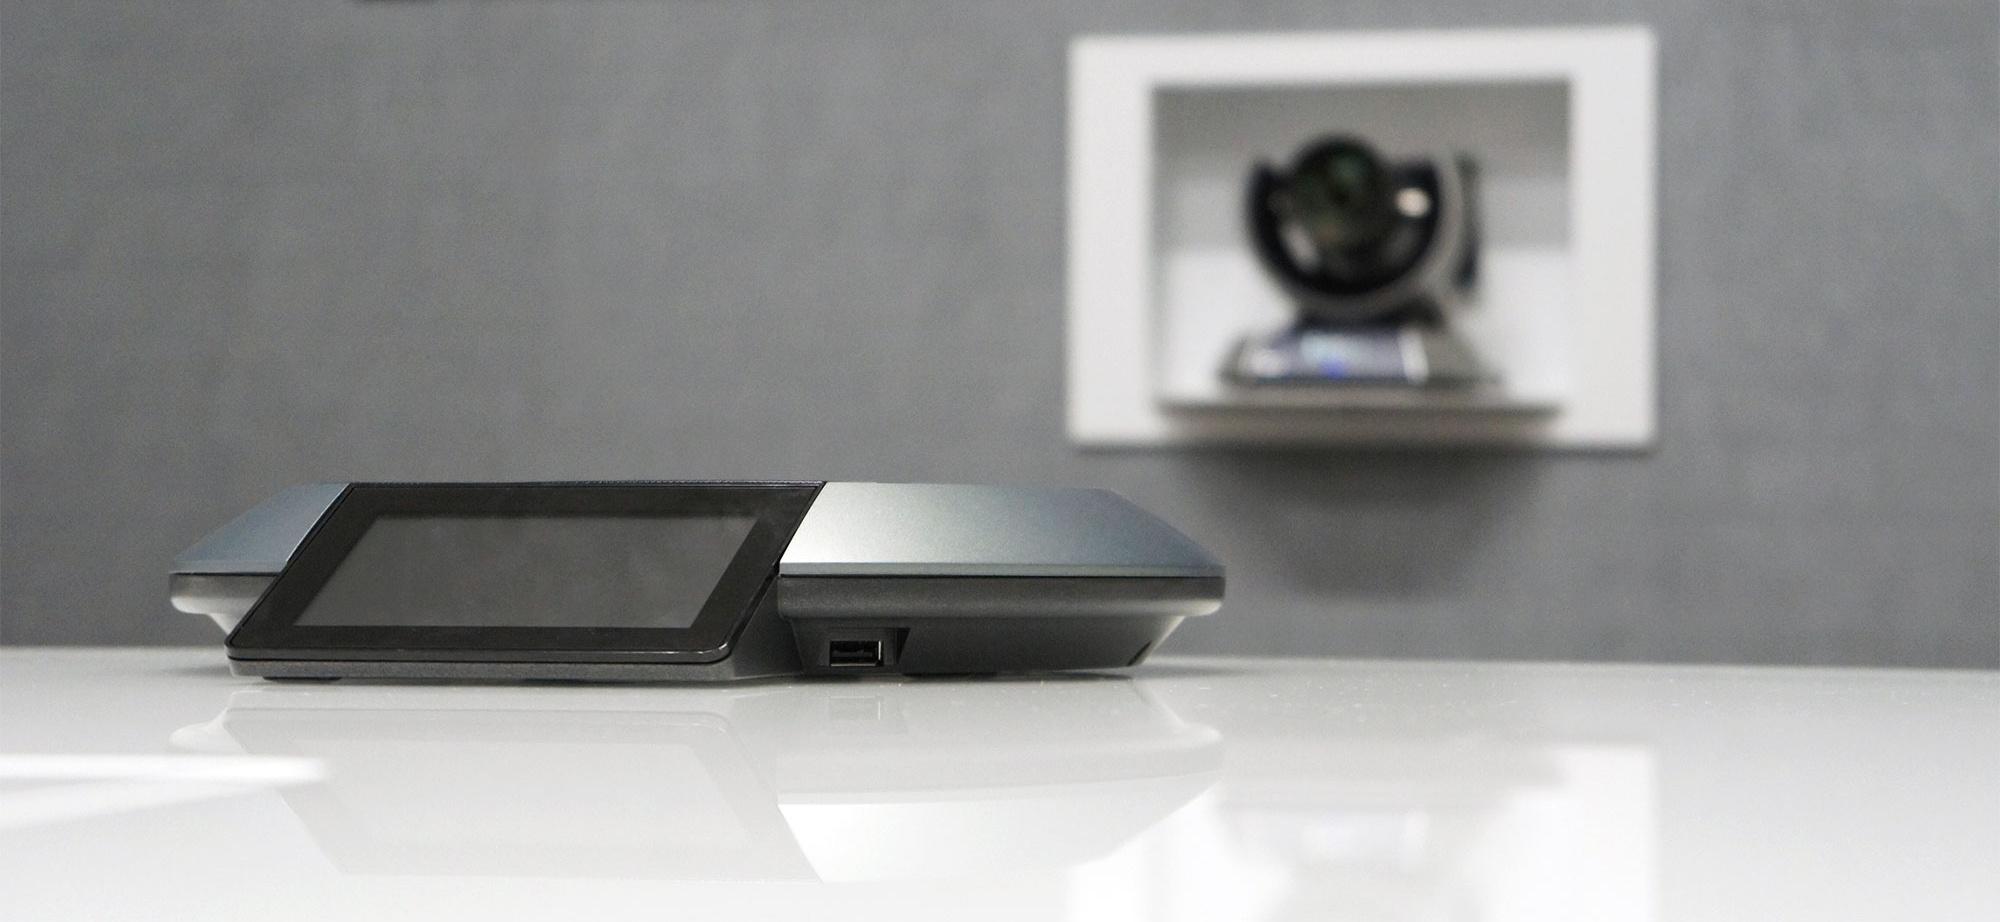 videoconference-equipment-635983-edited.jpg